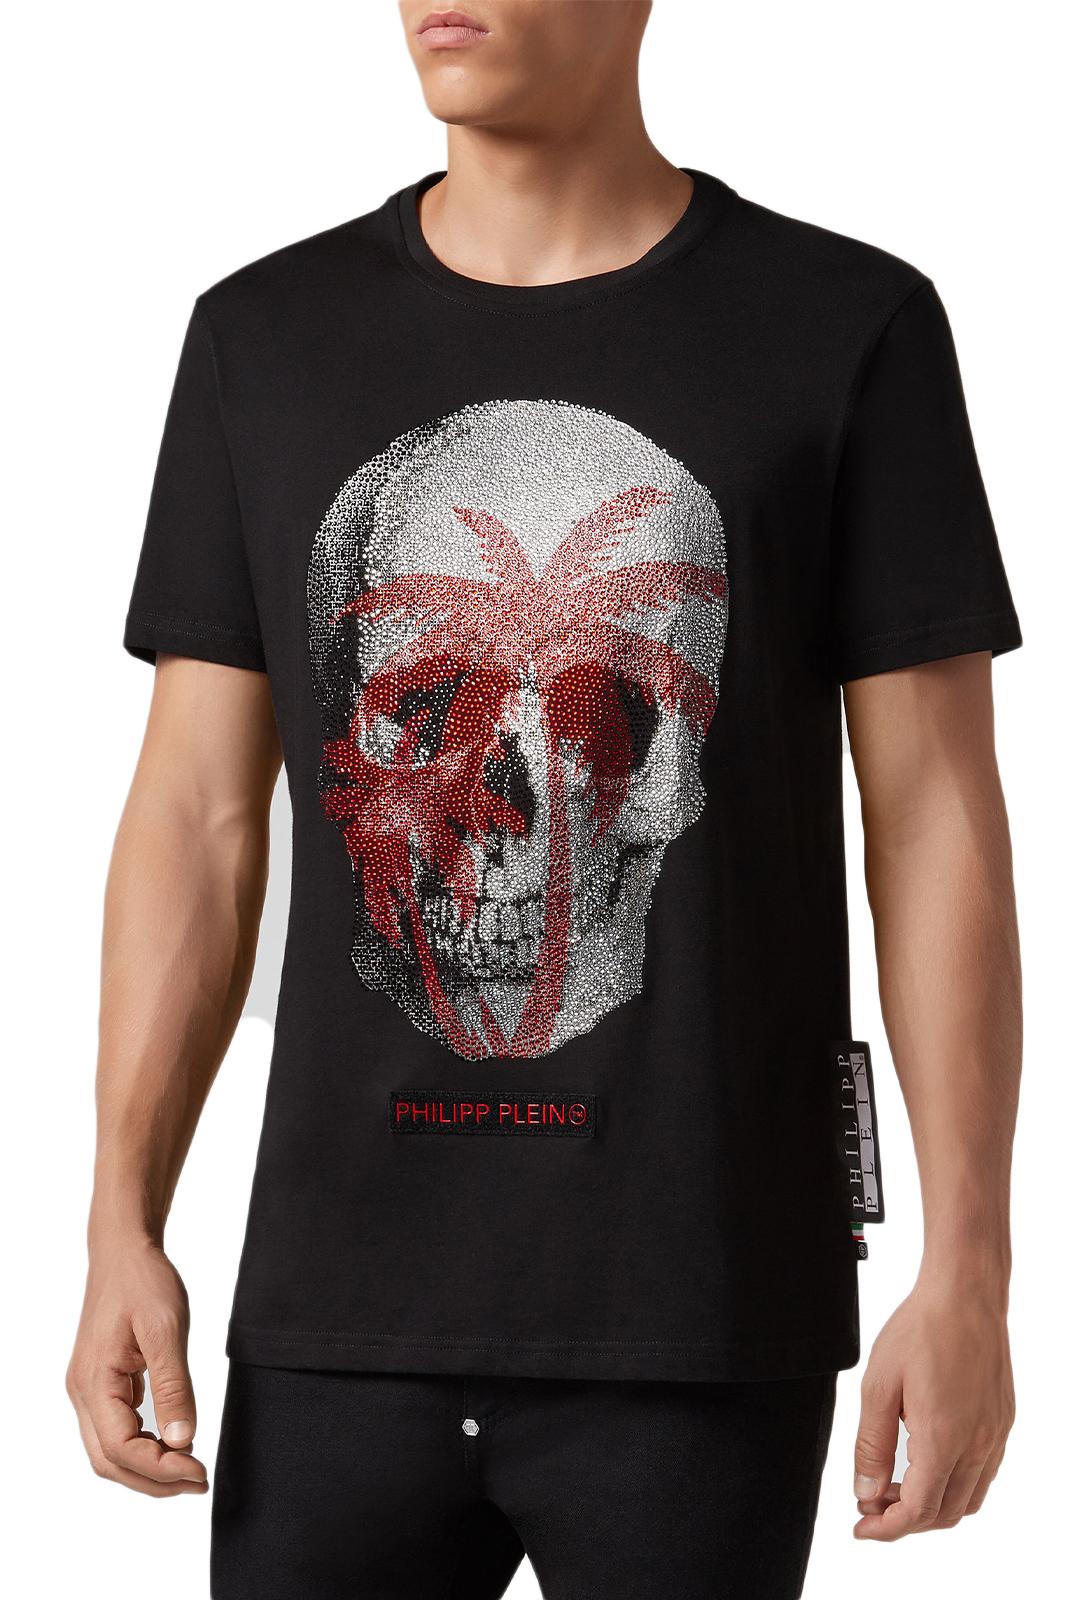 Tee-shirts  Philipp plein MTK3070 Platinum Cut Round Neck Aloha Plein BLACK